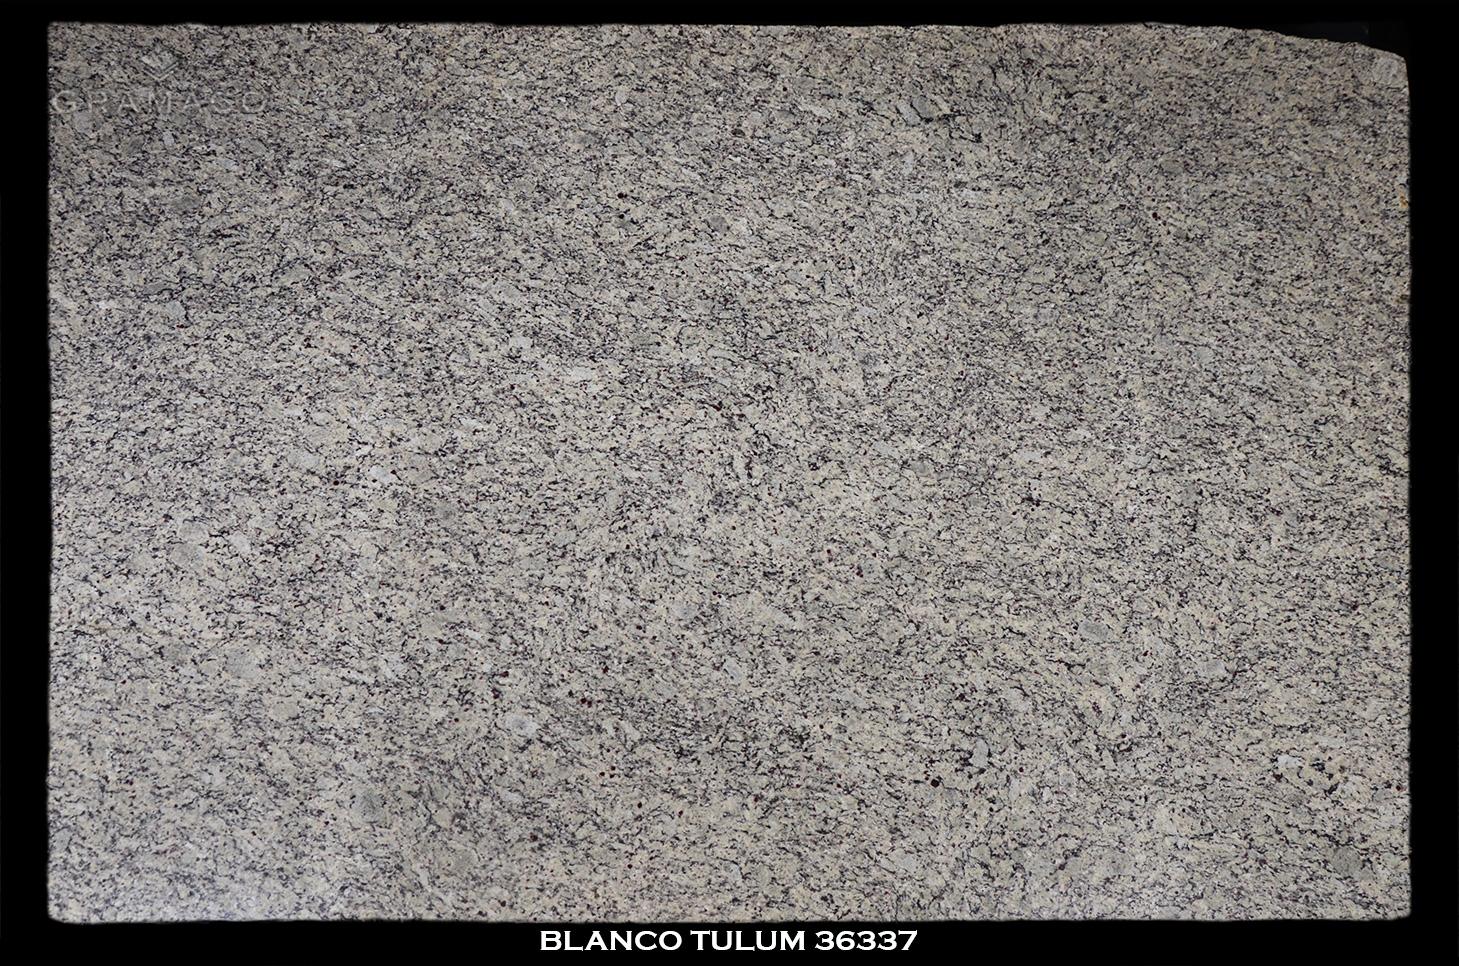 BLANCO-TULUM-36337